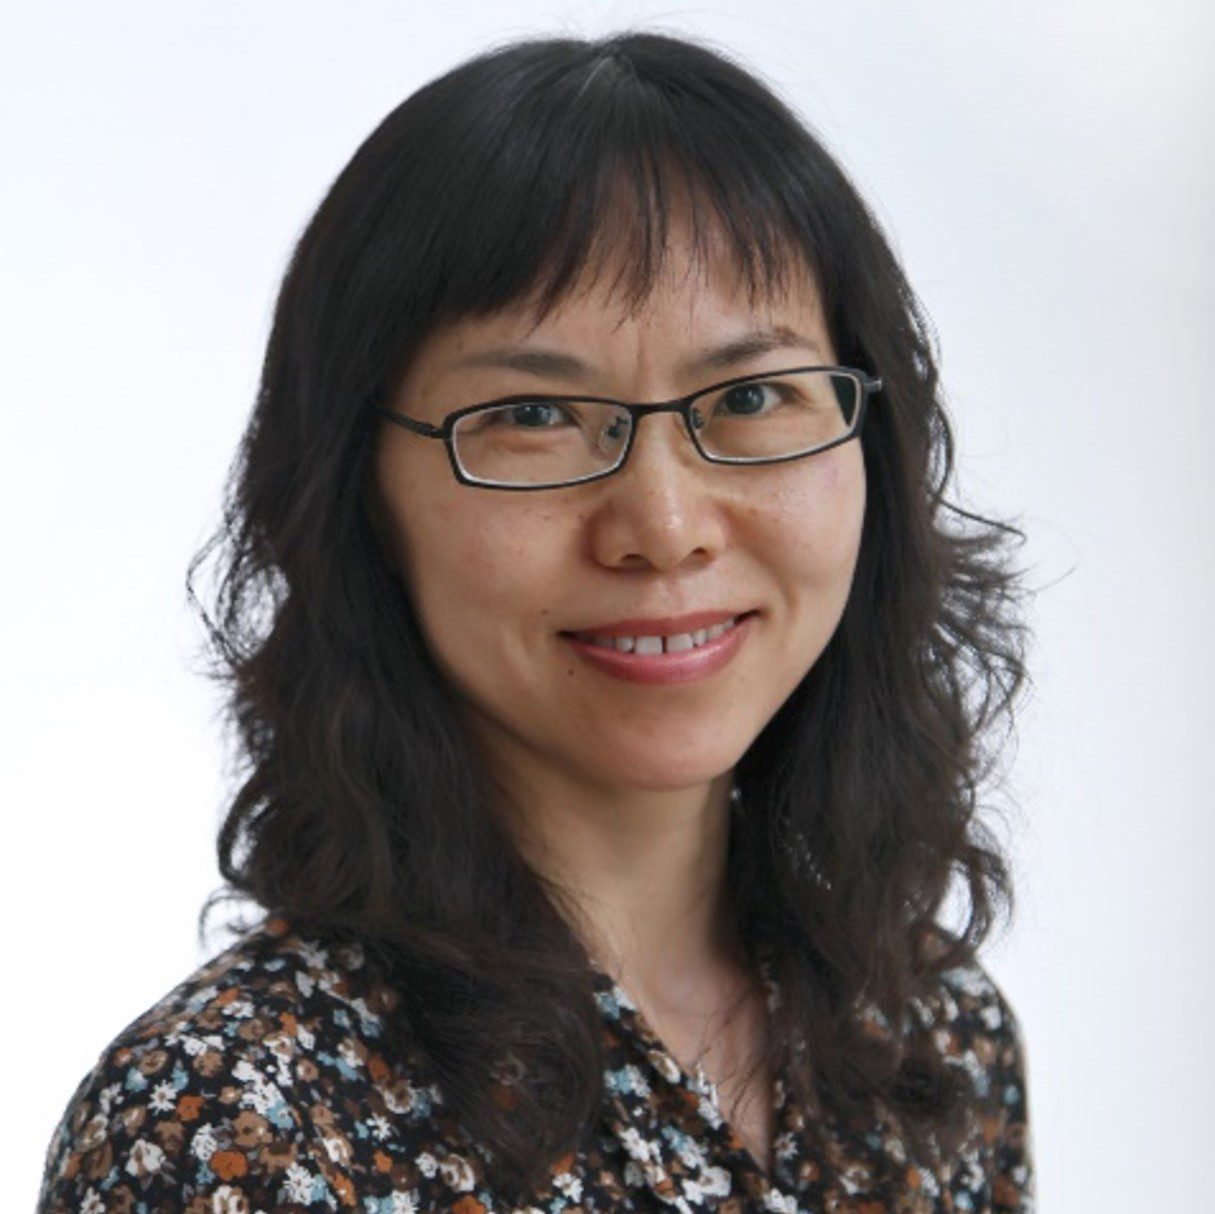 黄逸珺 Yijun Huang